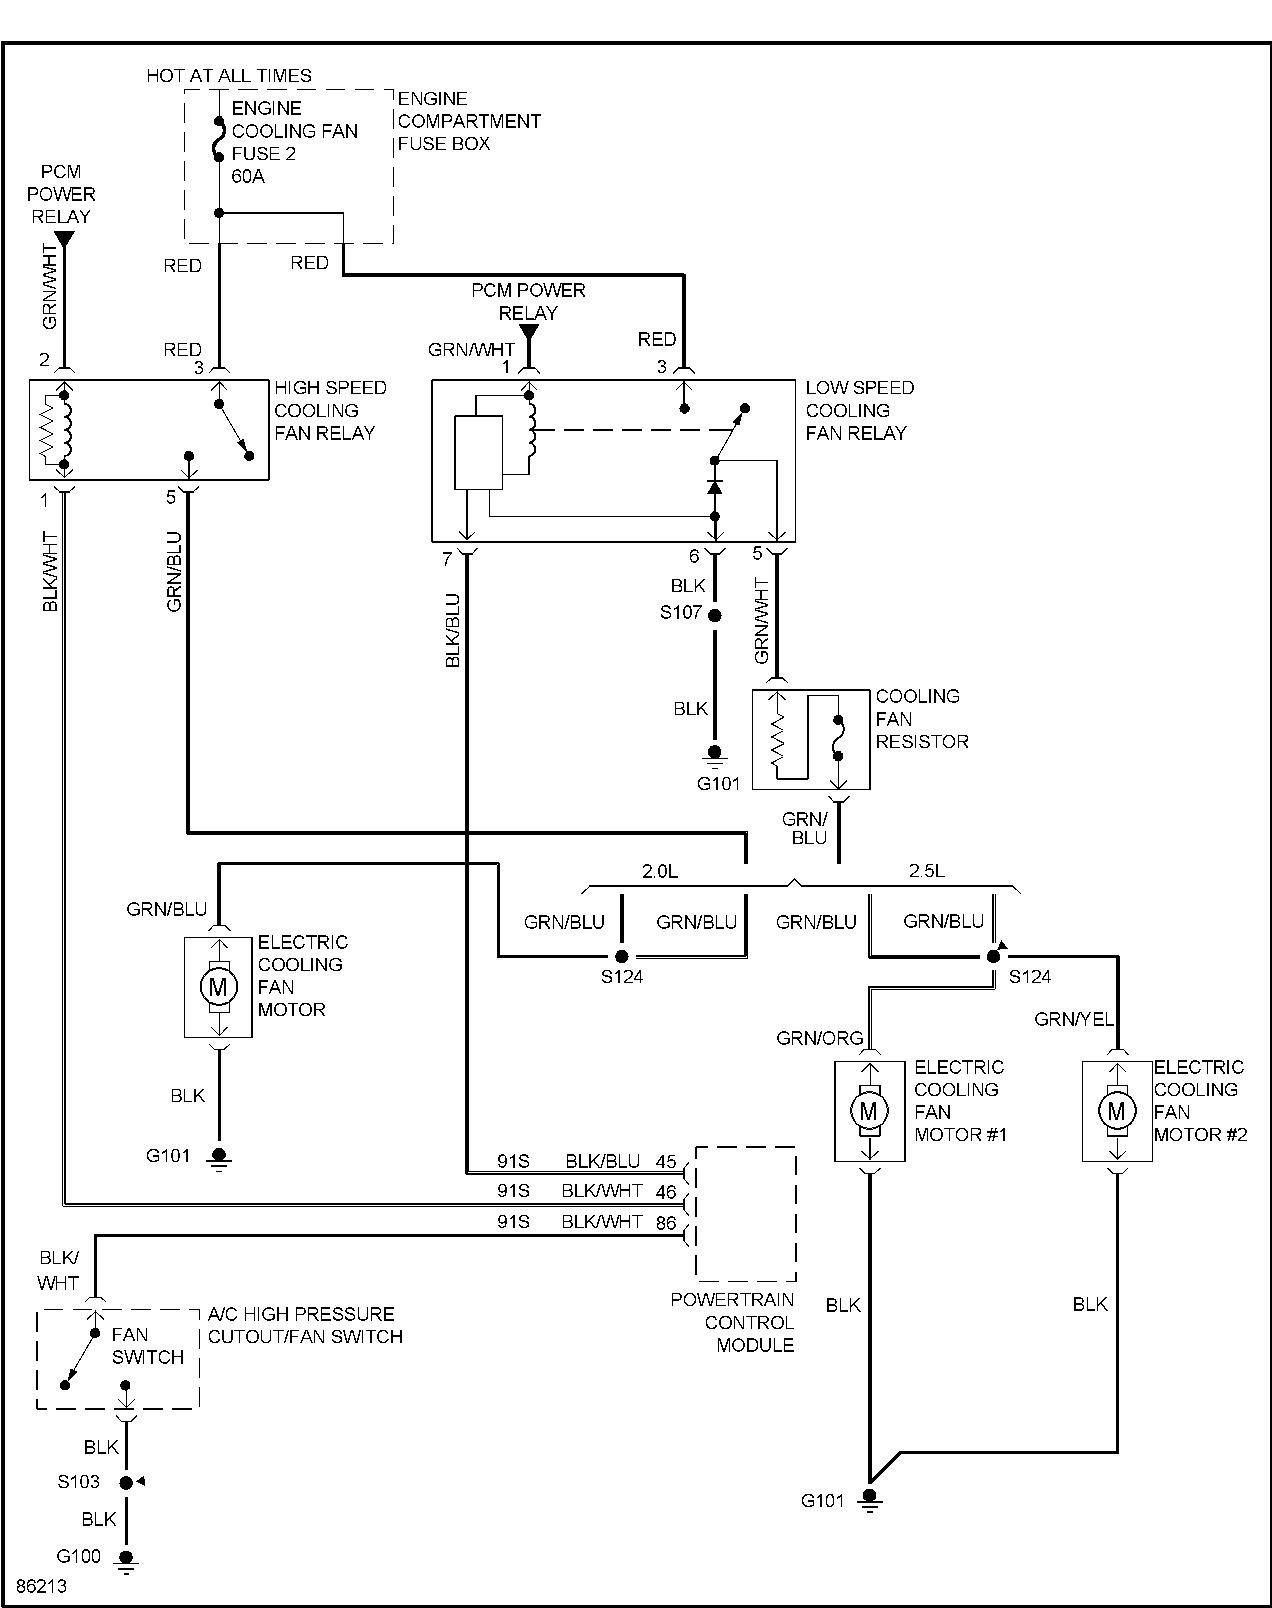 Diagram Ford Contour Wiring Diagram Full Version Hd Quality Wiring Diagram Diagramnixg Seagullsully It